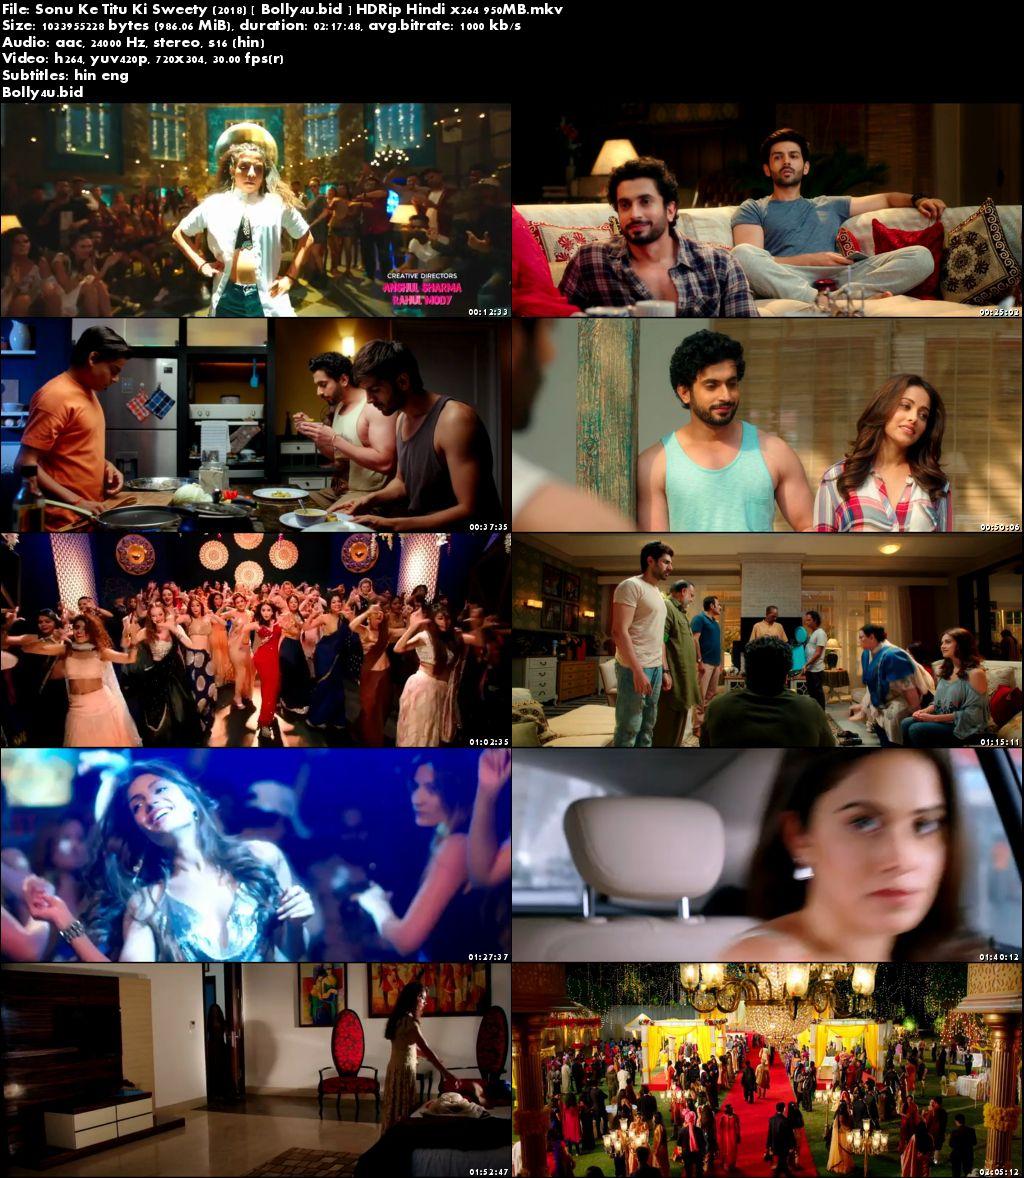 Sonu Ke Titu Ki Sweety 2018 HDRip 950MB Full Hindi Movie Download x264